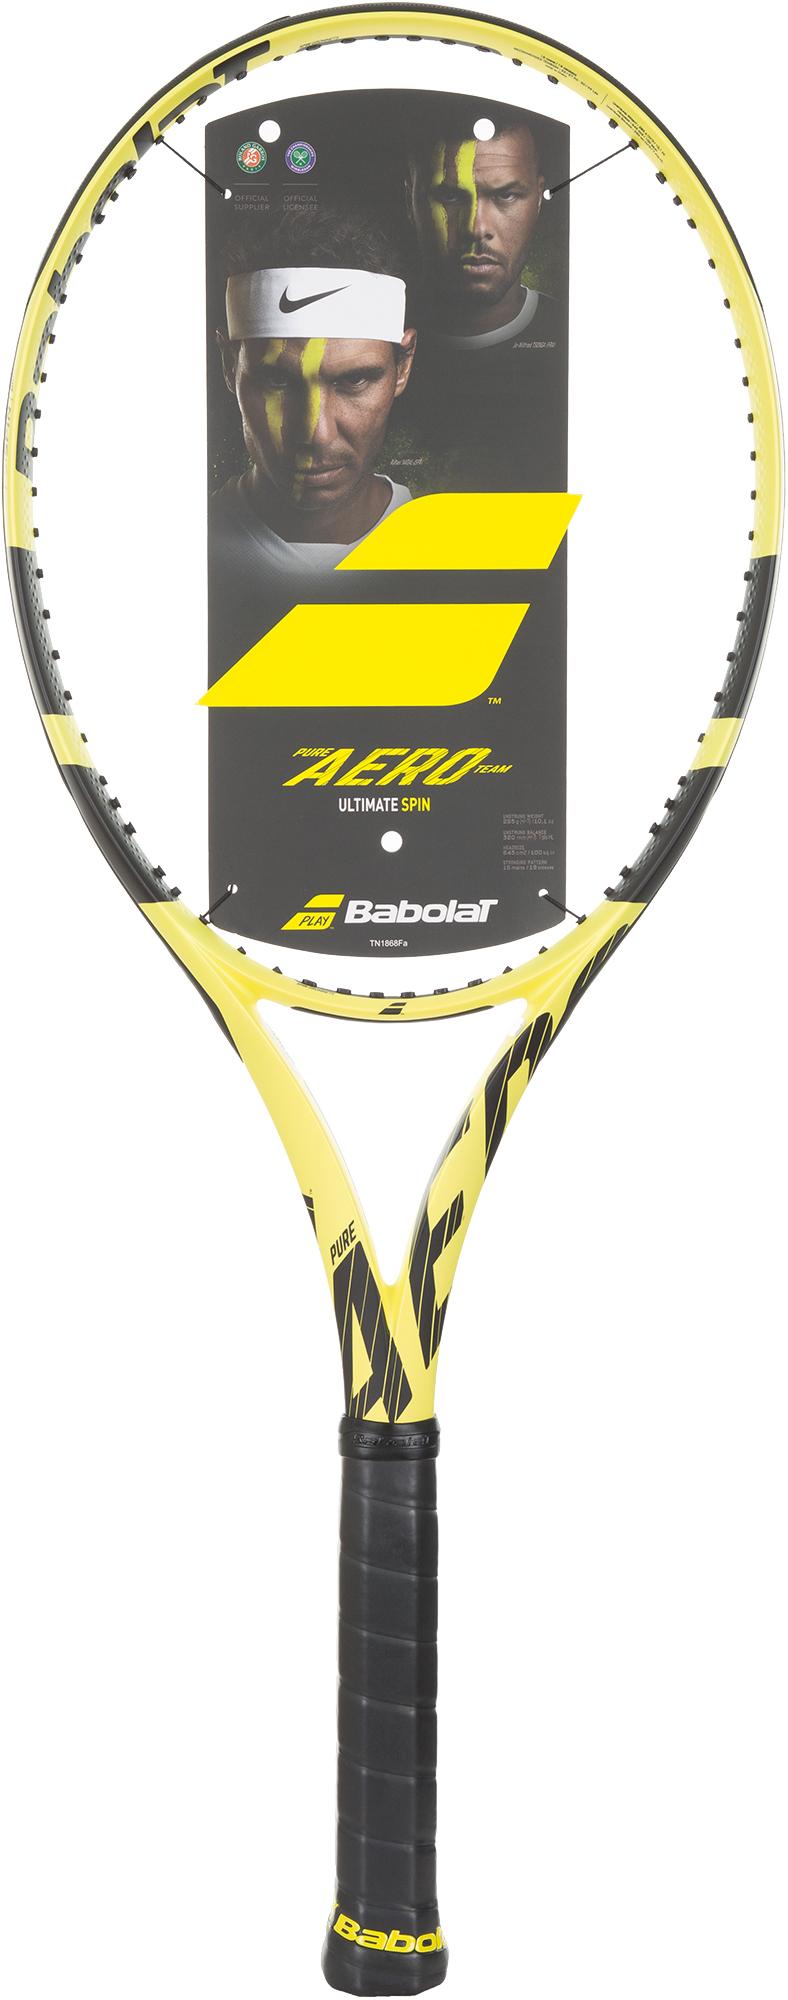 Babolat Ракетка для большого тенниса Babolat Pure Aero Team, размер 4 babolat ракетка для большого тенниса детская babolat ballfighter 19 размер без размера